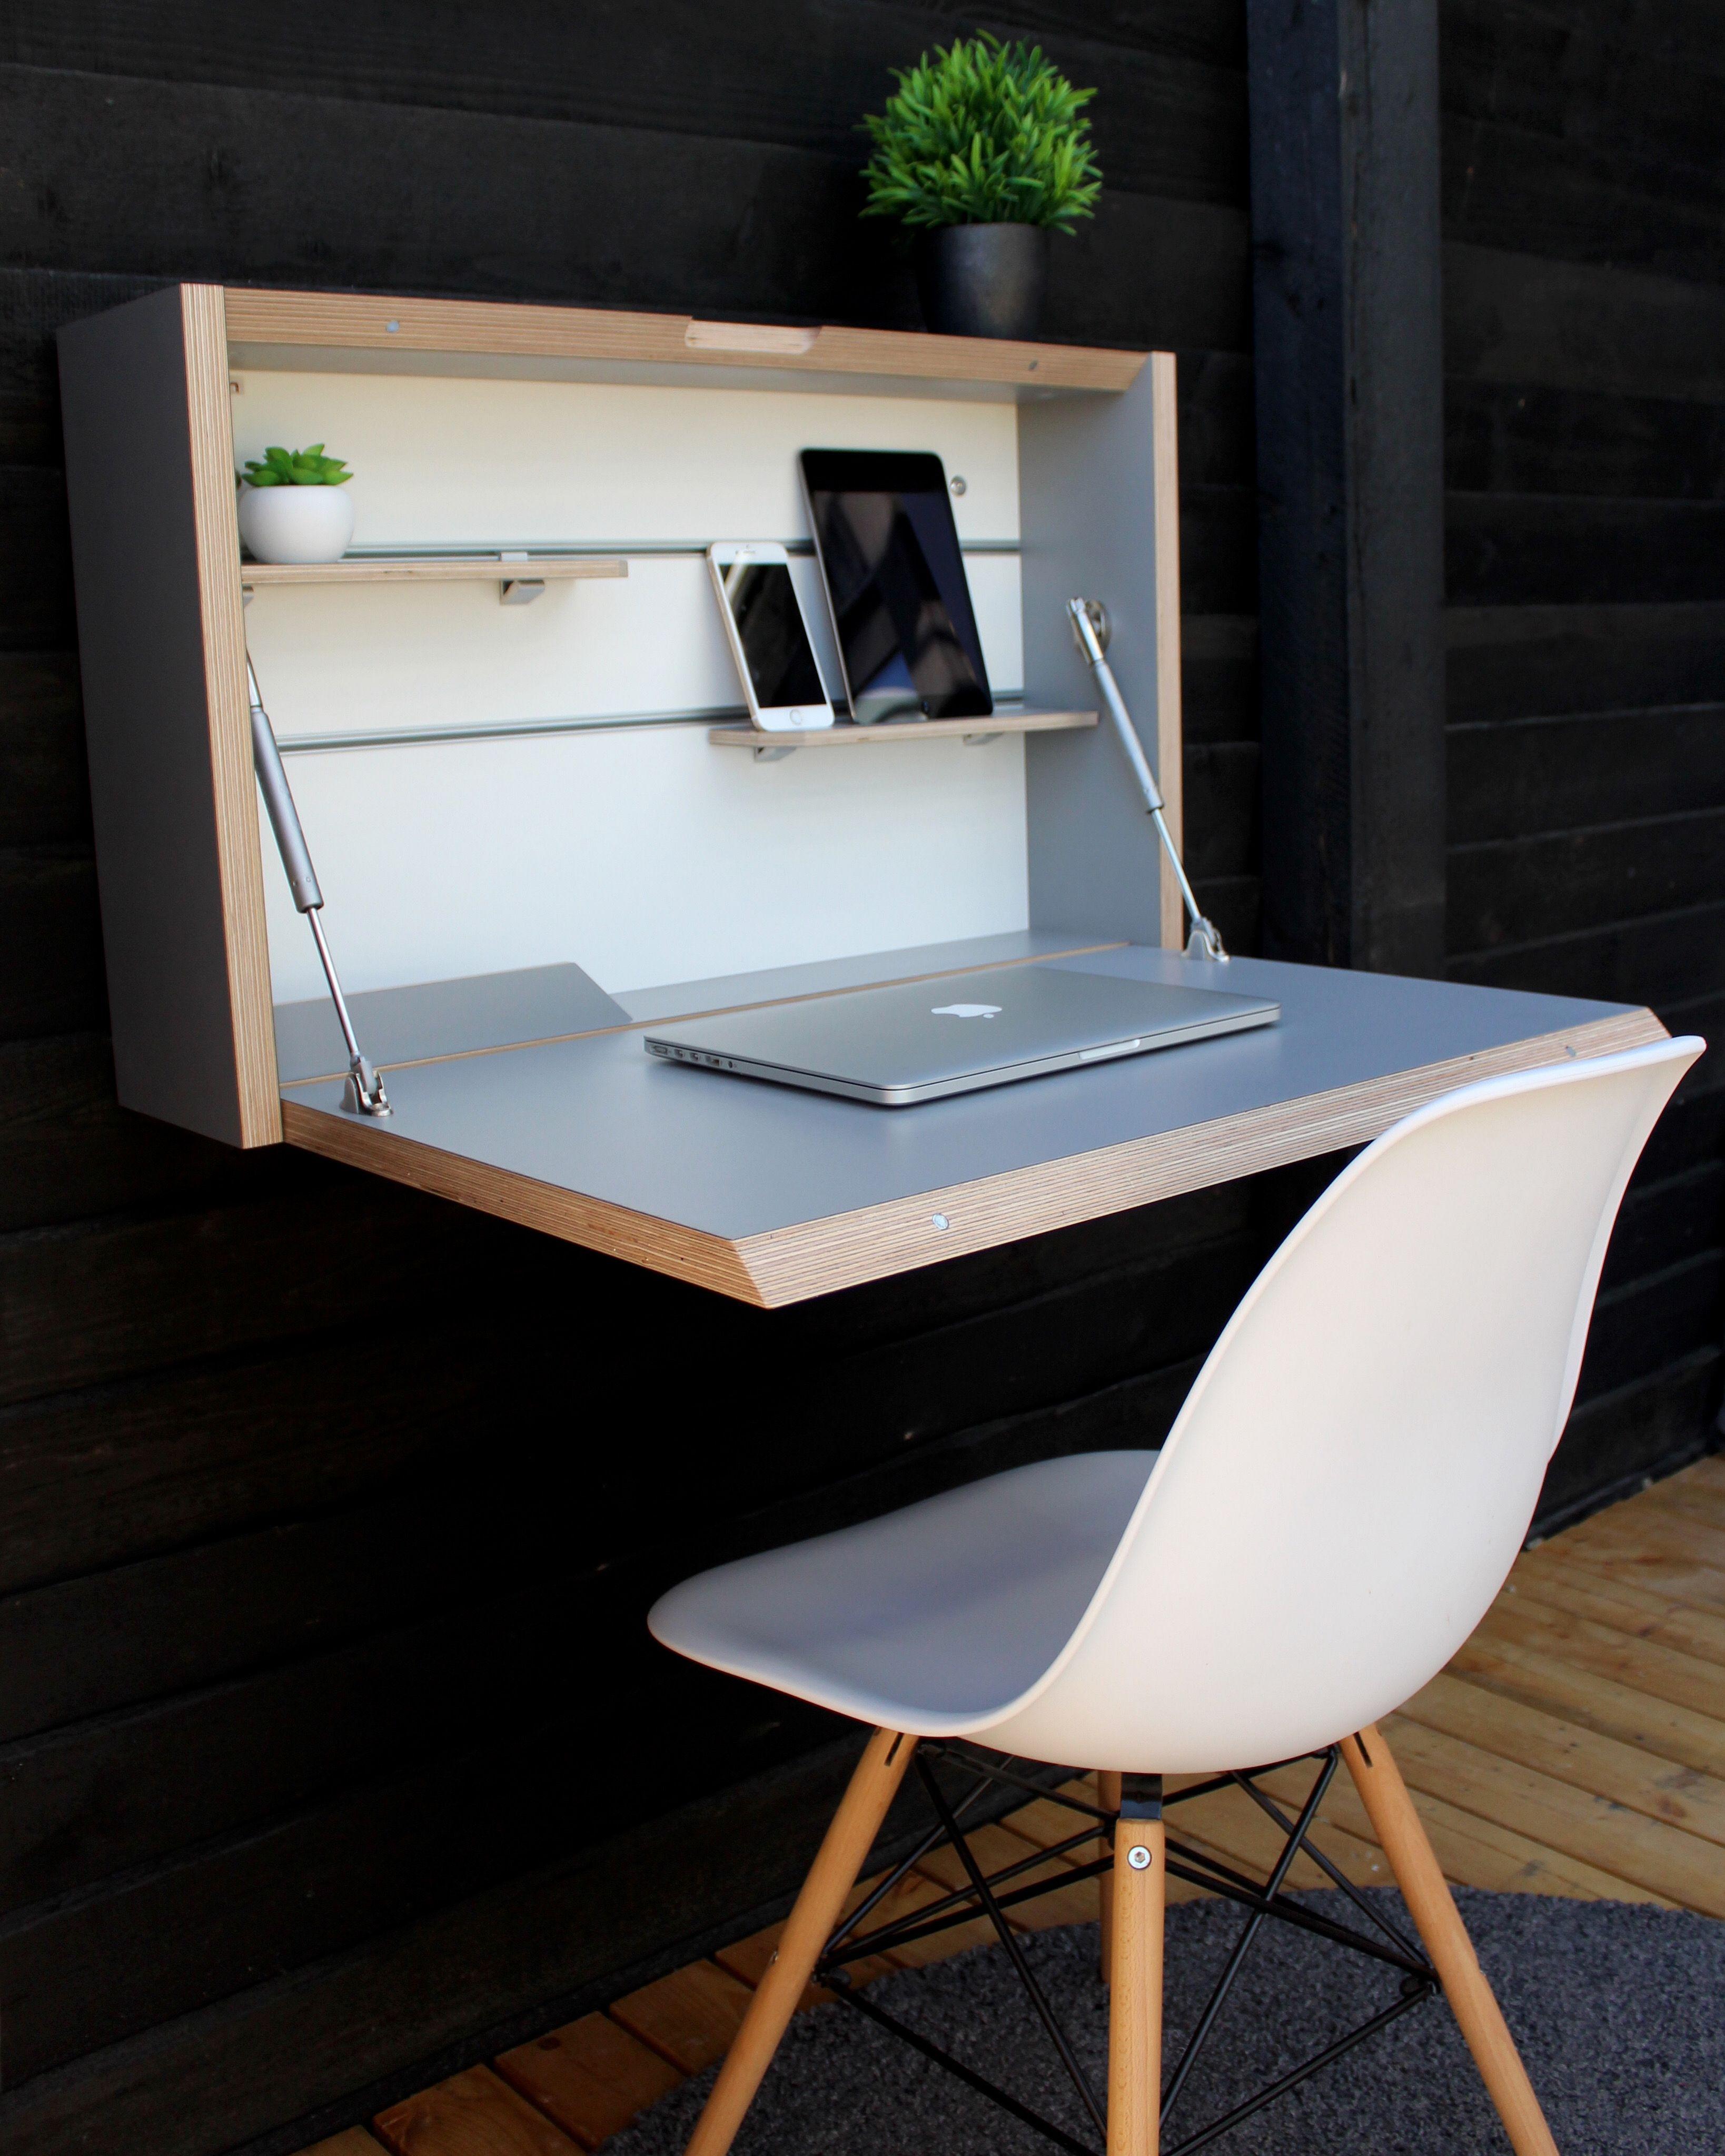 Wall Mounted Folding Desk Space Saving Desk Office Desk Etsy In 2021 Fold Down Desk Folding Desk Wall Mounted Folding Table